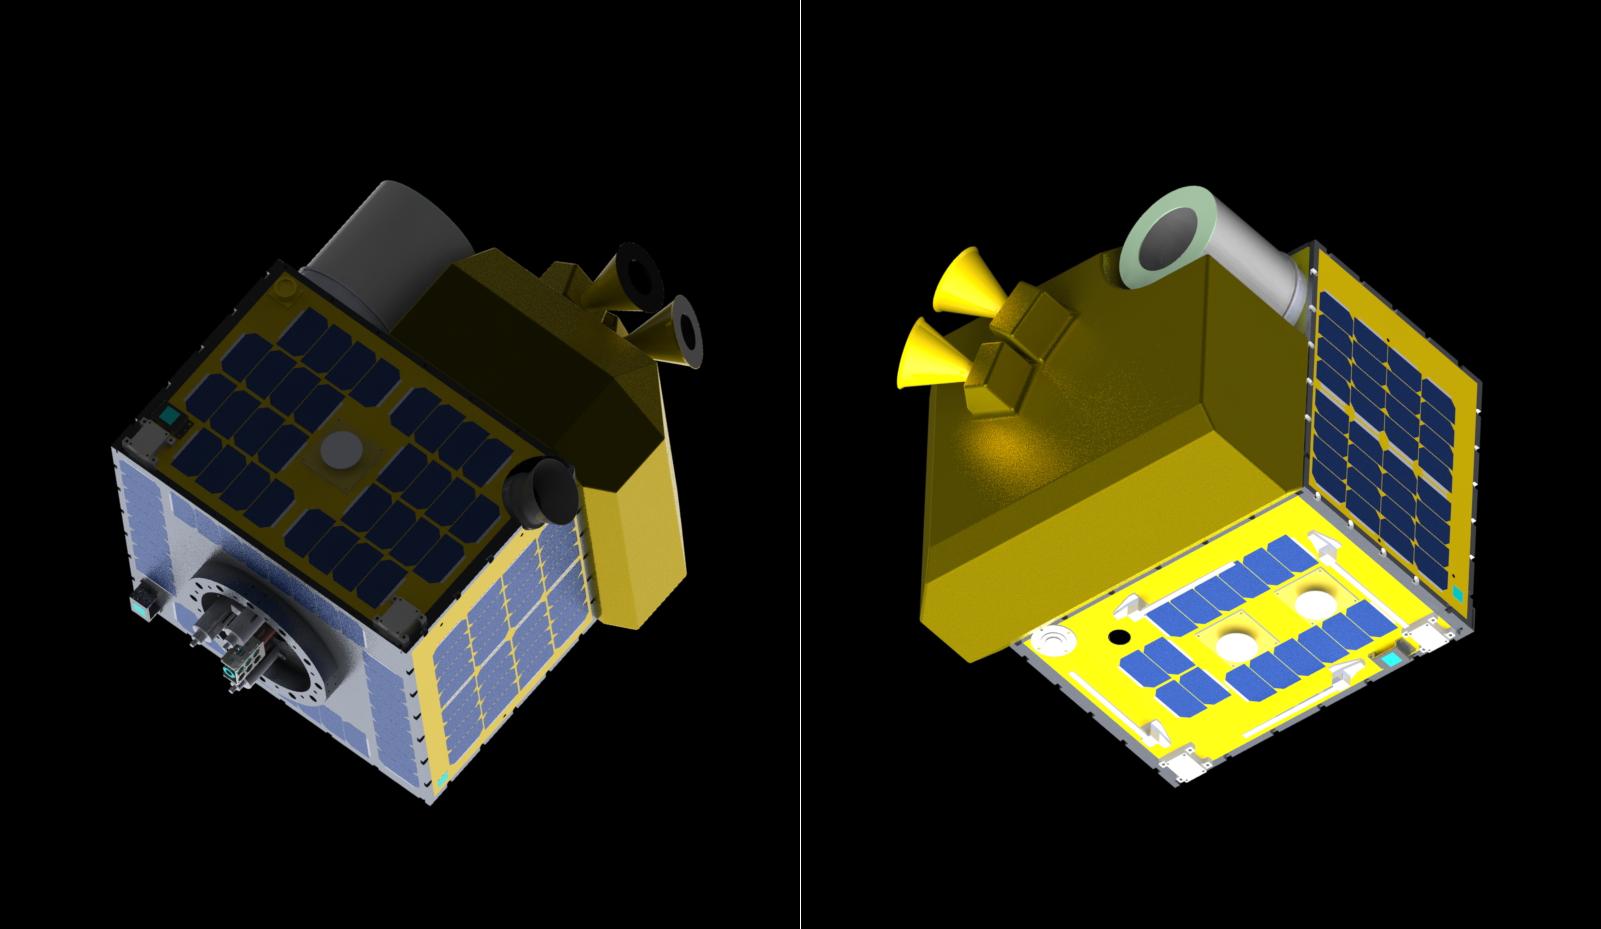 ALEが打ち上げる人工衛星(CG)